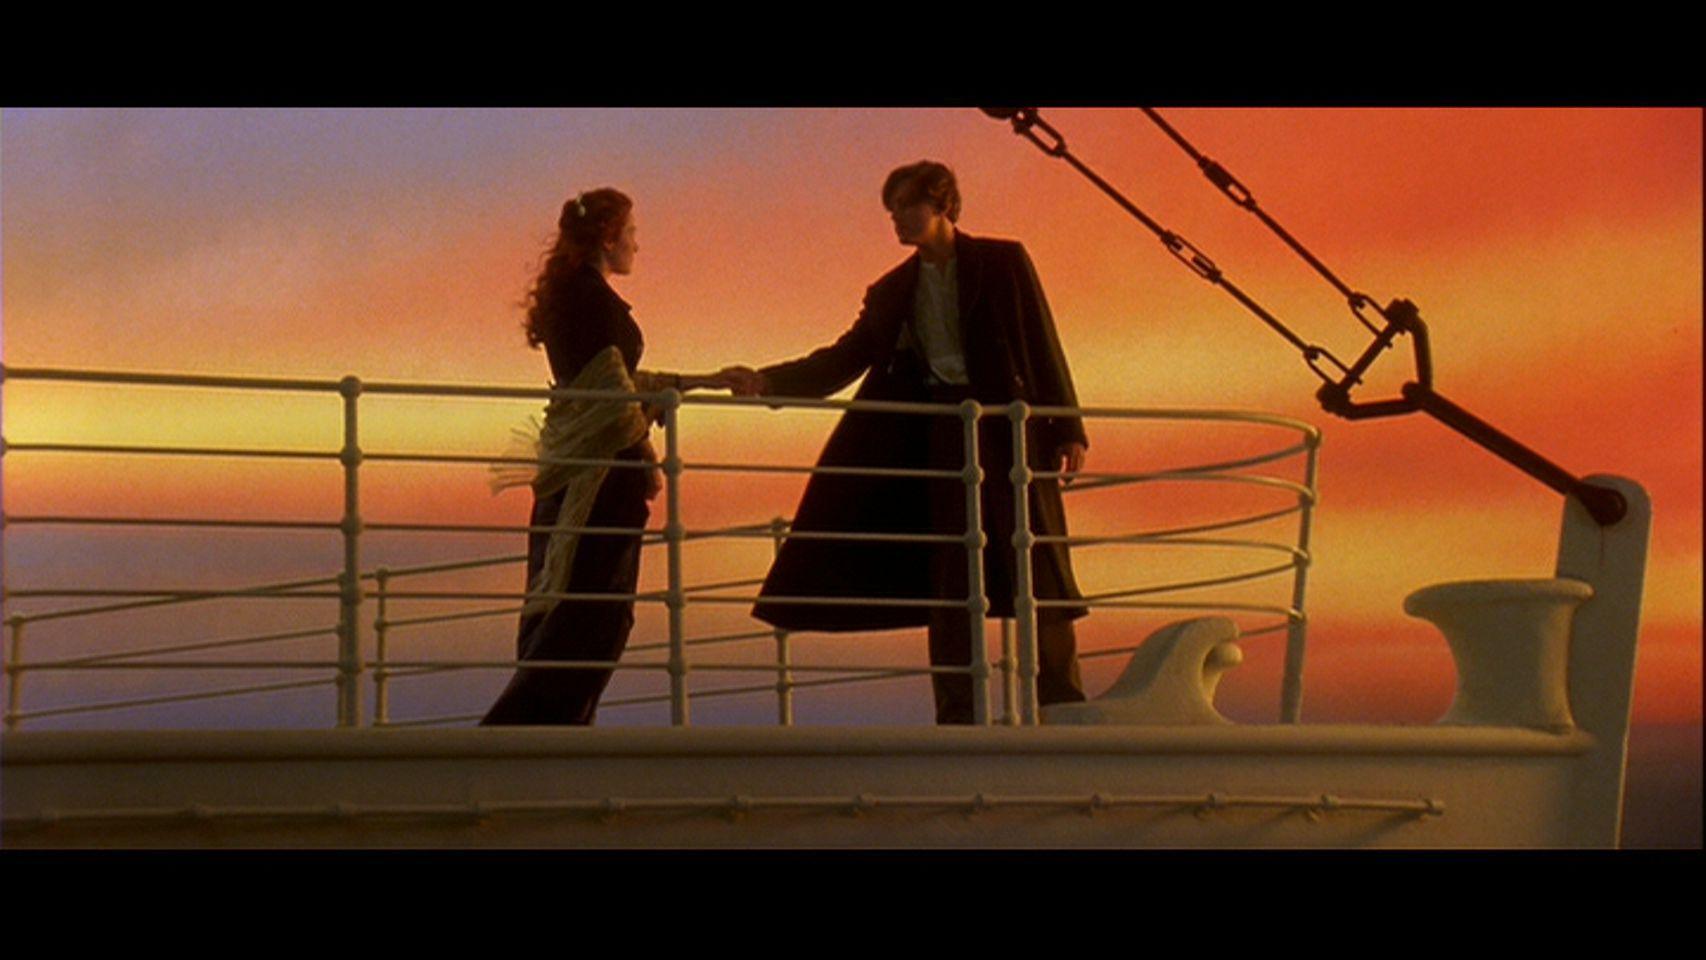 Girl Kiss To Boy Wallpaper Titanic A Romantic Love Story Love Image 21254776